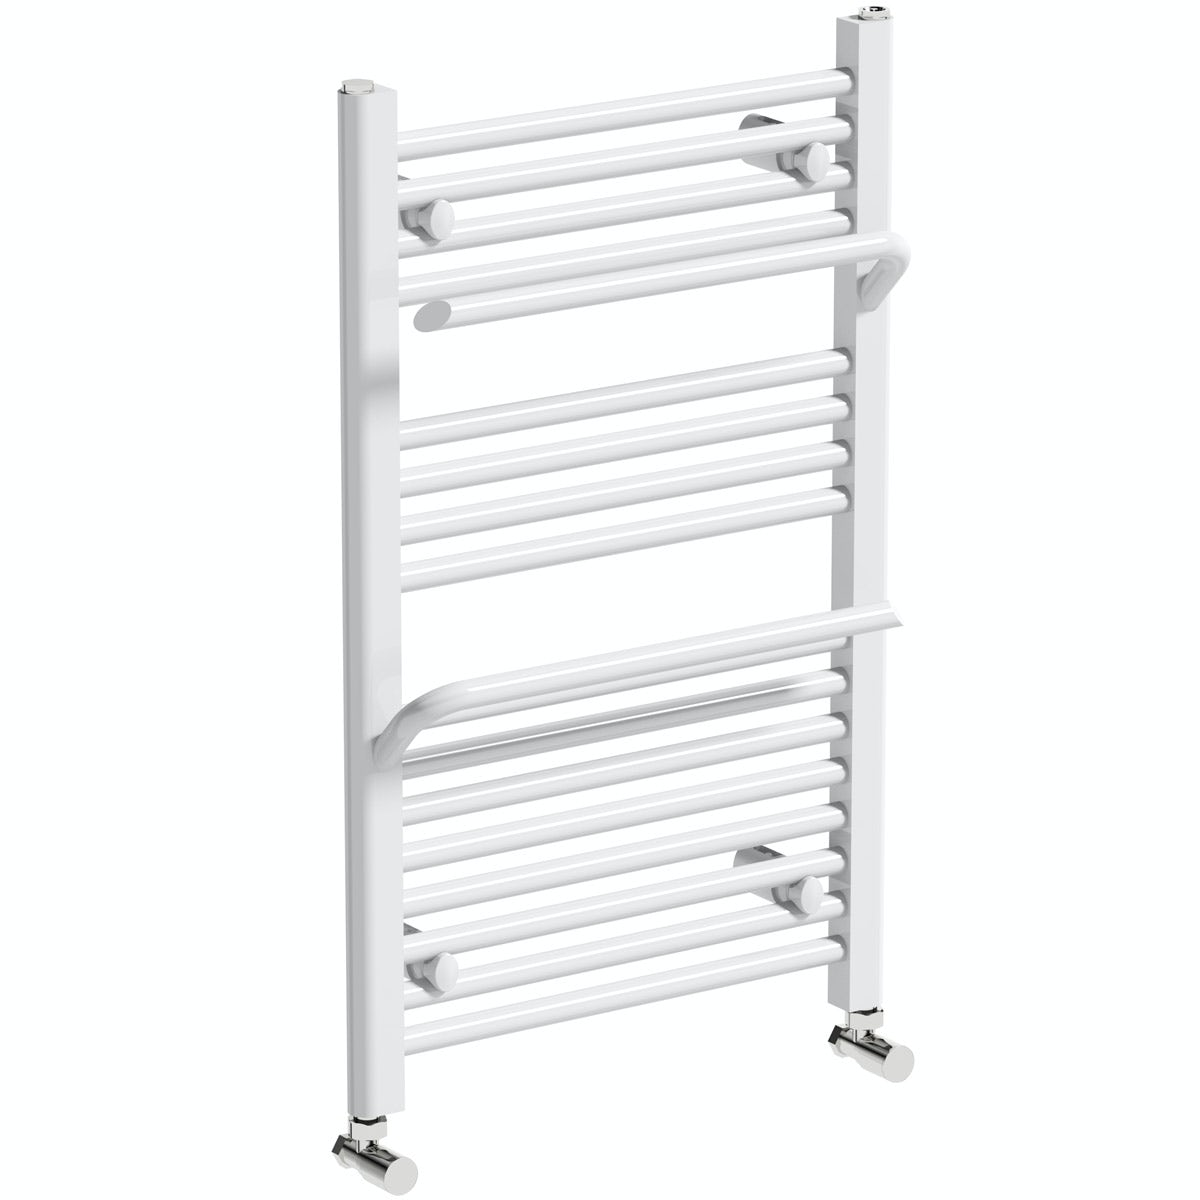 Mode Rohe white heated towel rail with hangers 800 x 500